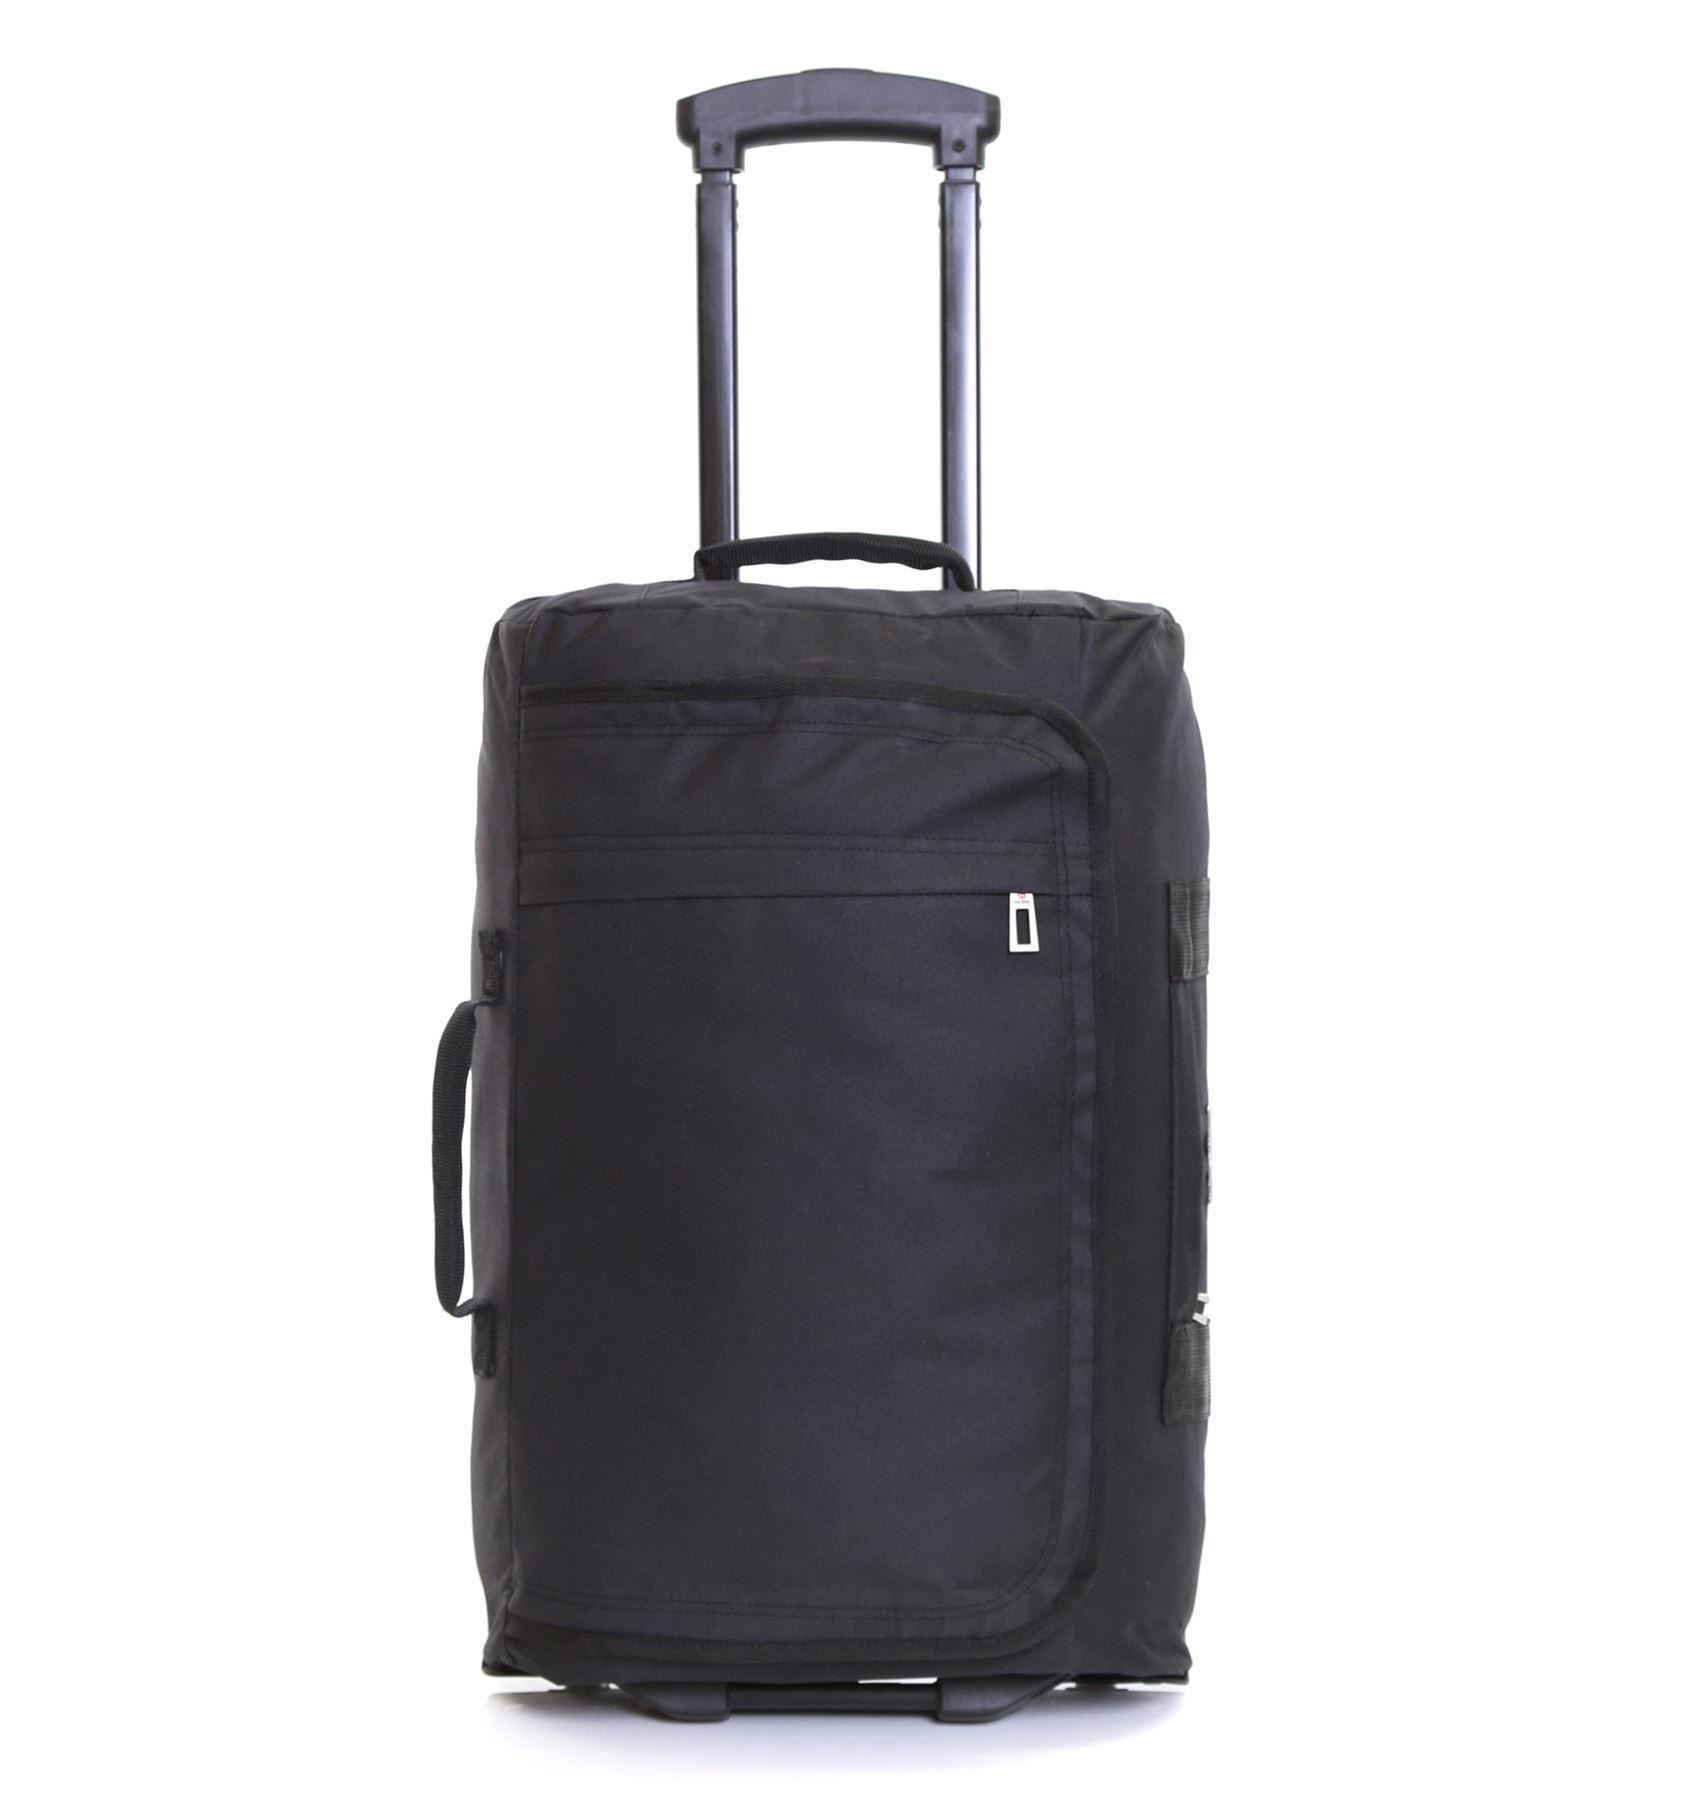 ryanair easyjet 55 cm valigia leggera trolley bagaglio borsa a mano con ruote ebay. Black Bedroom Furniture Sets. Home Design Ideas